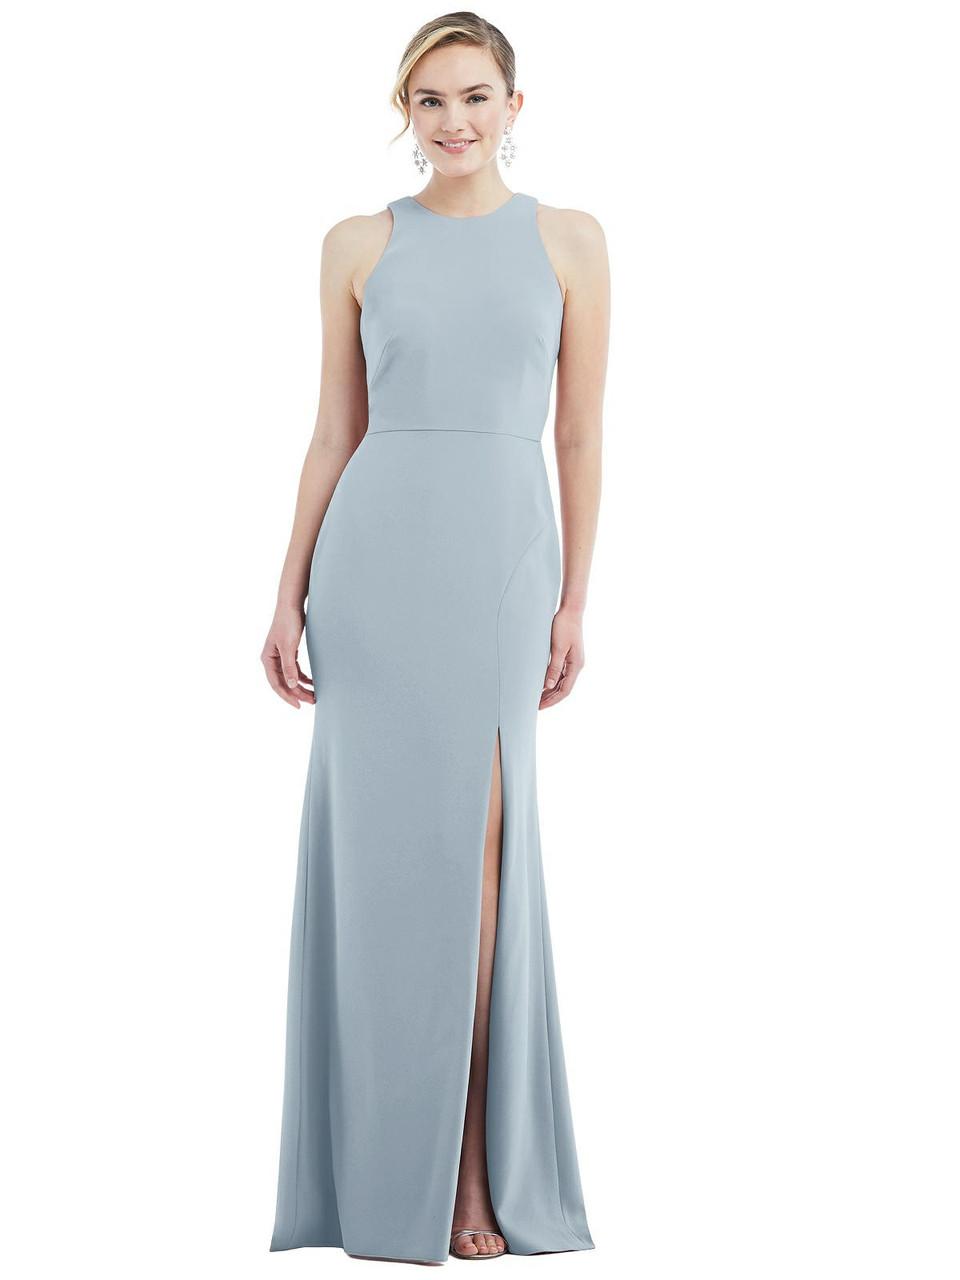 Dessy Bridesmaid Dress 3084 - Crepe